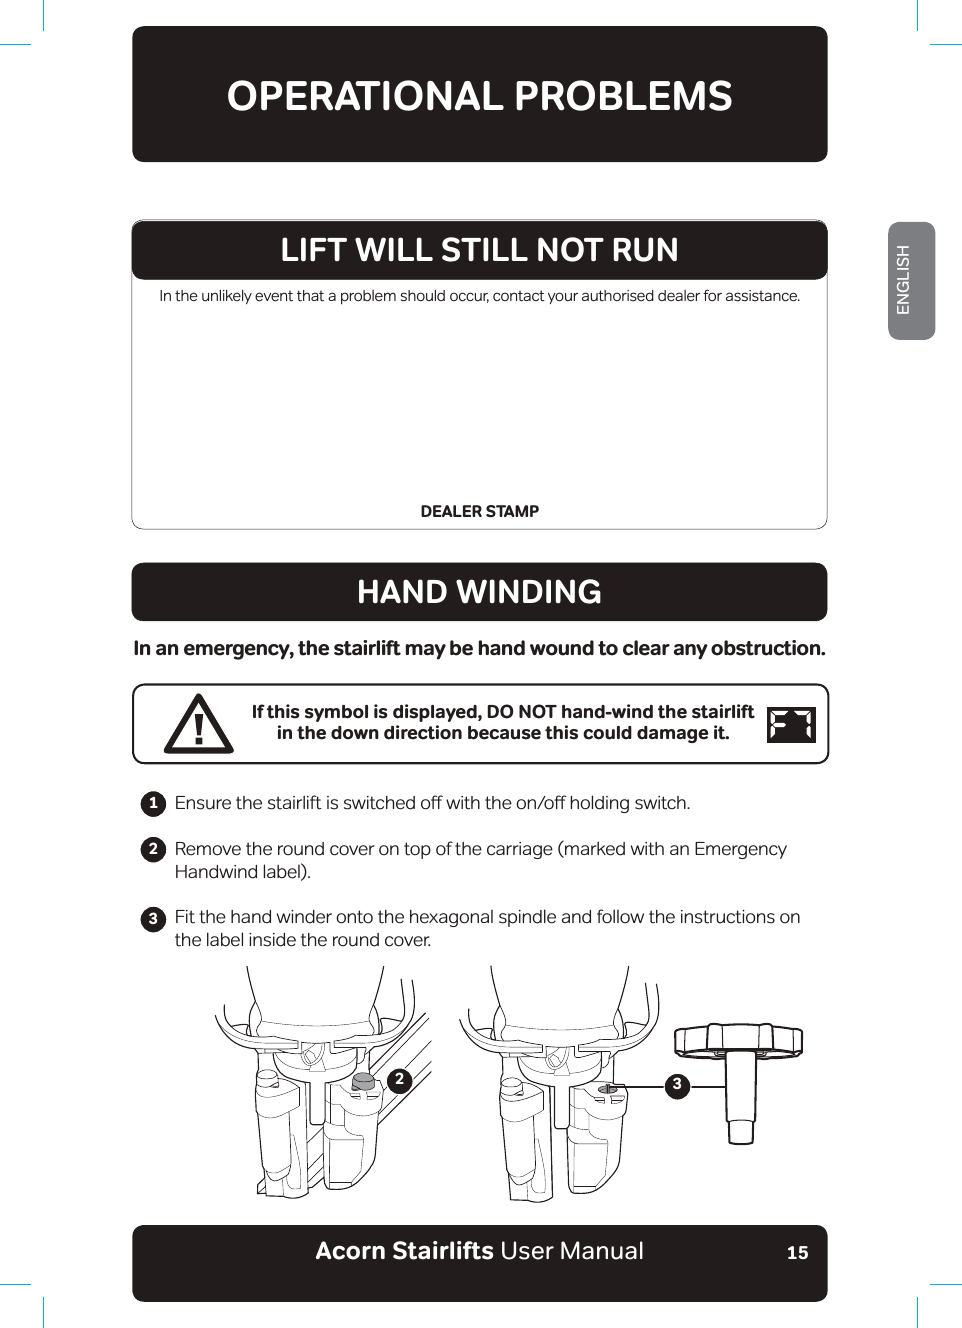 Acorn Stairlift Error Codes New The Best Code Of 2018